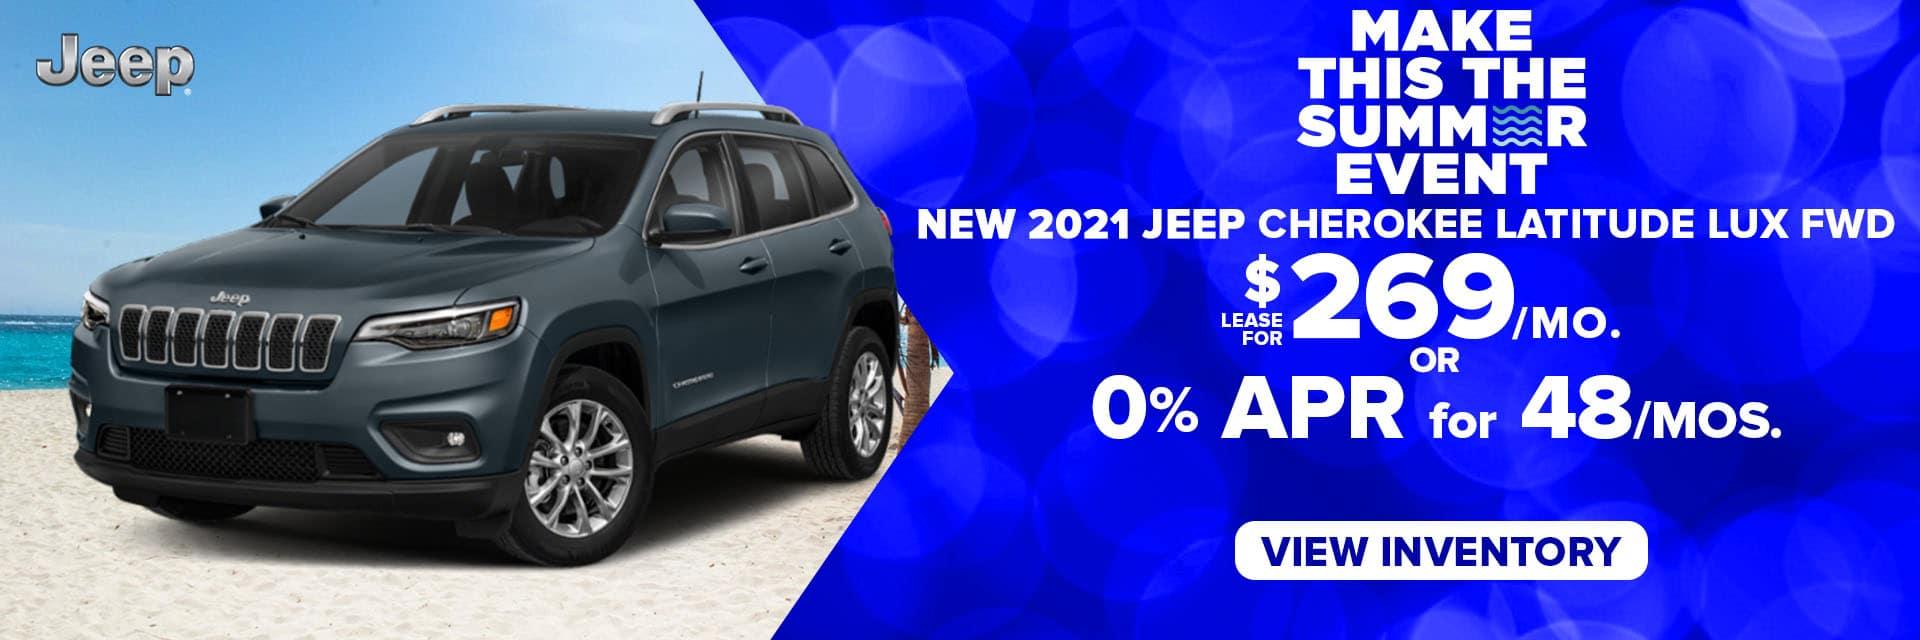 CLGO-July 2021-2021 Jeep Cherokee copy